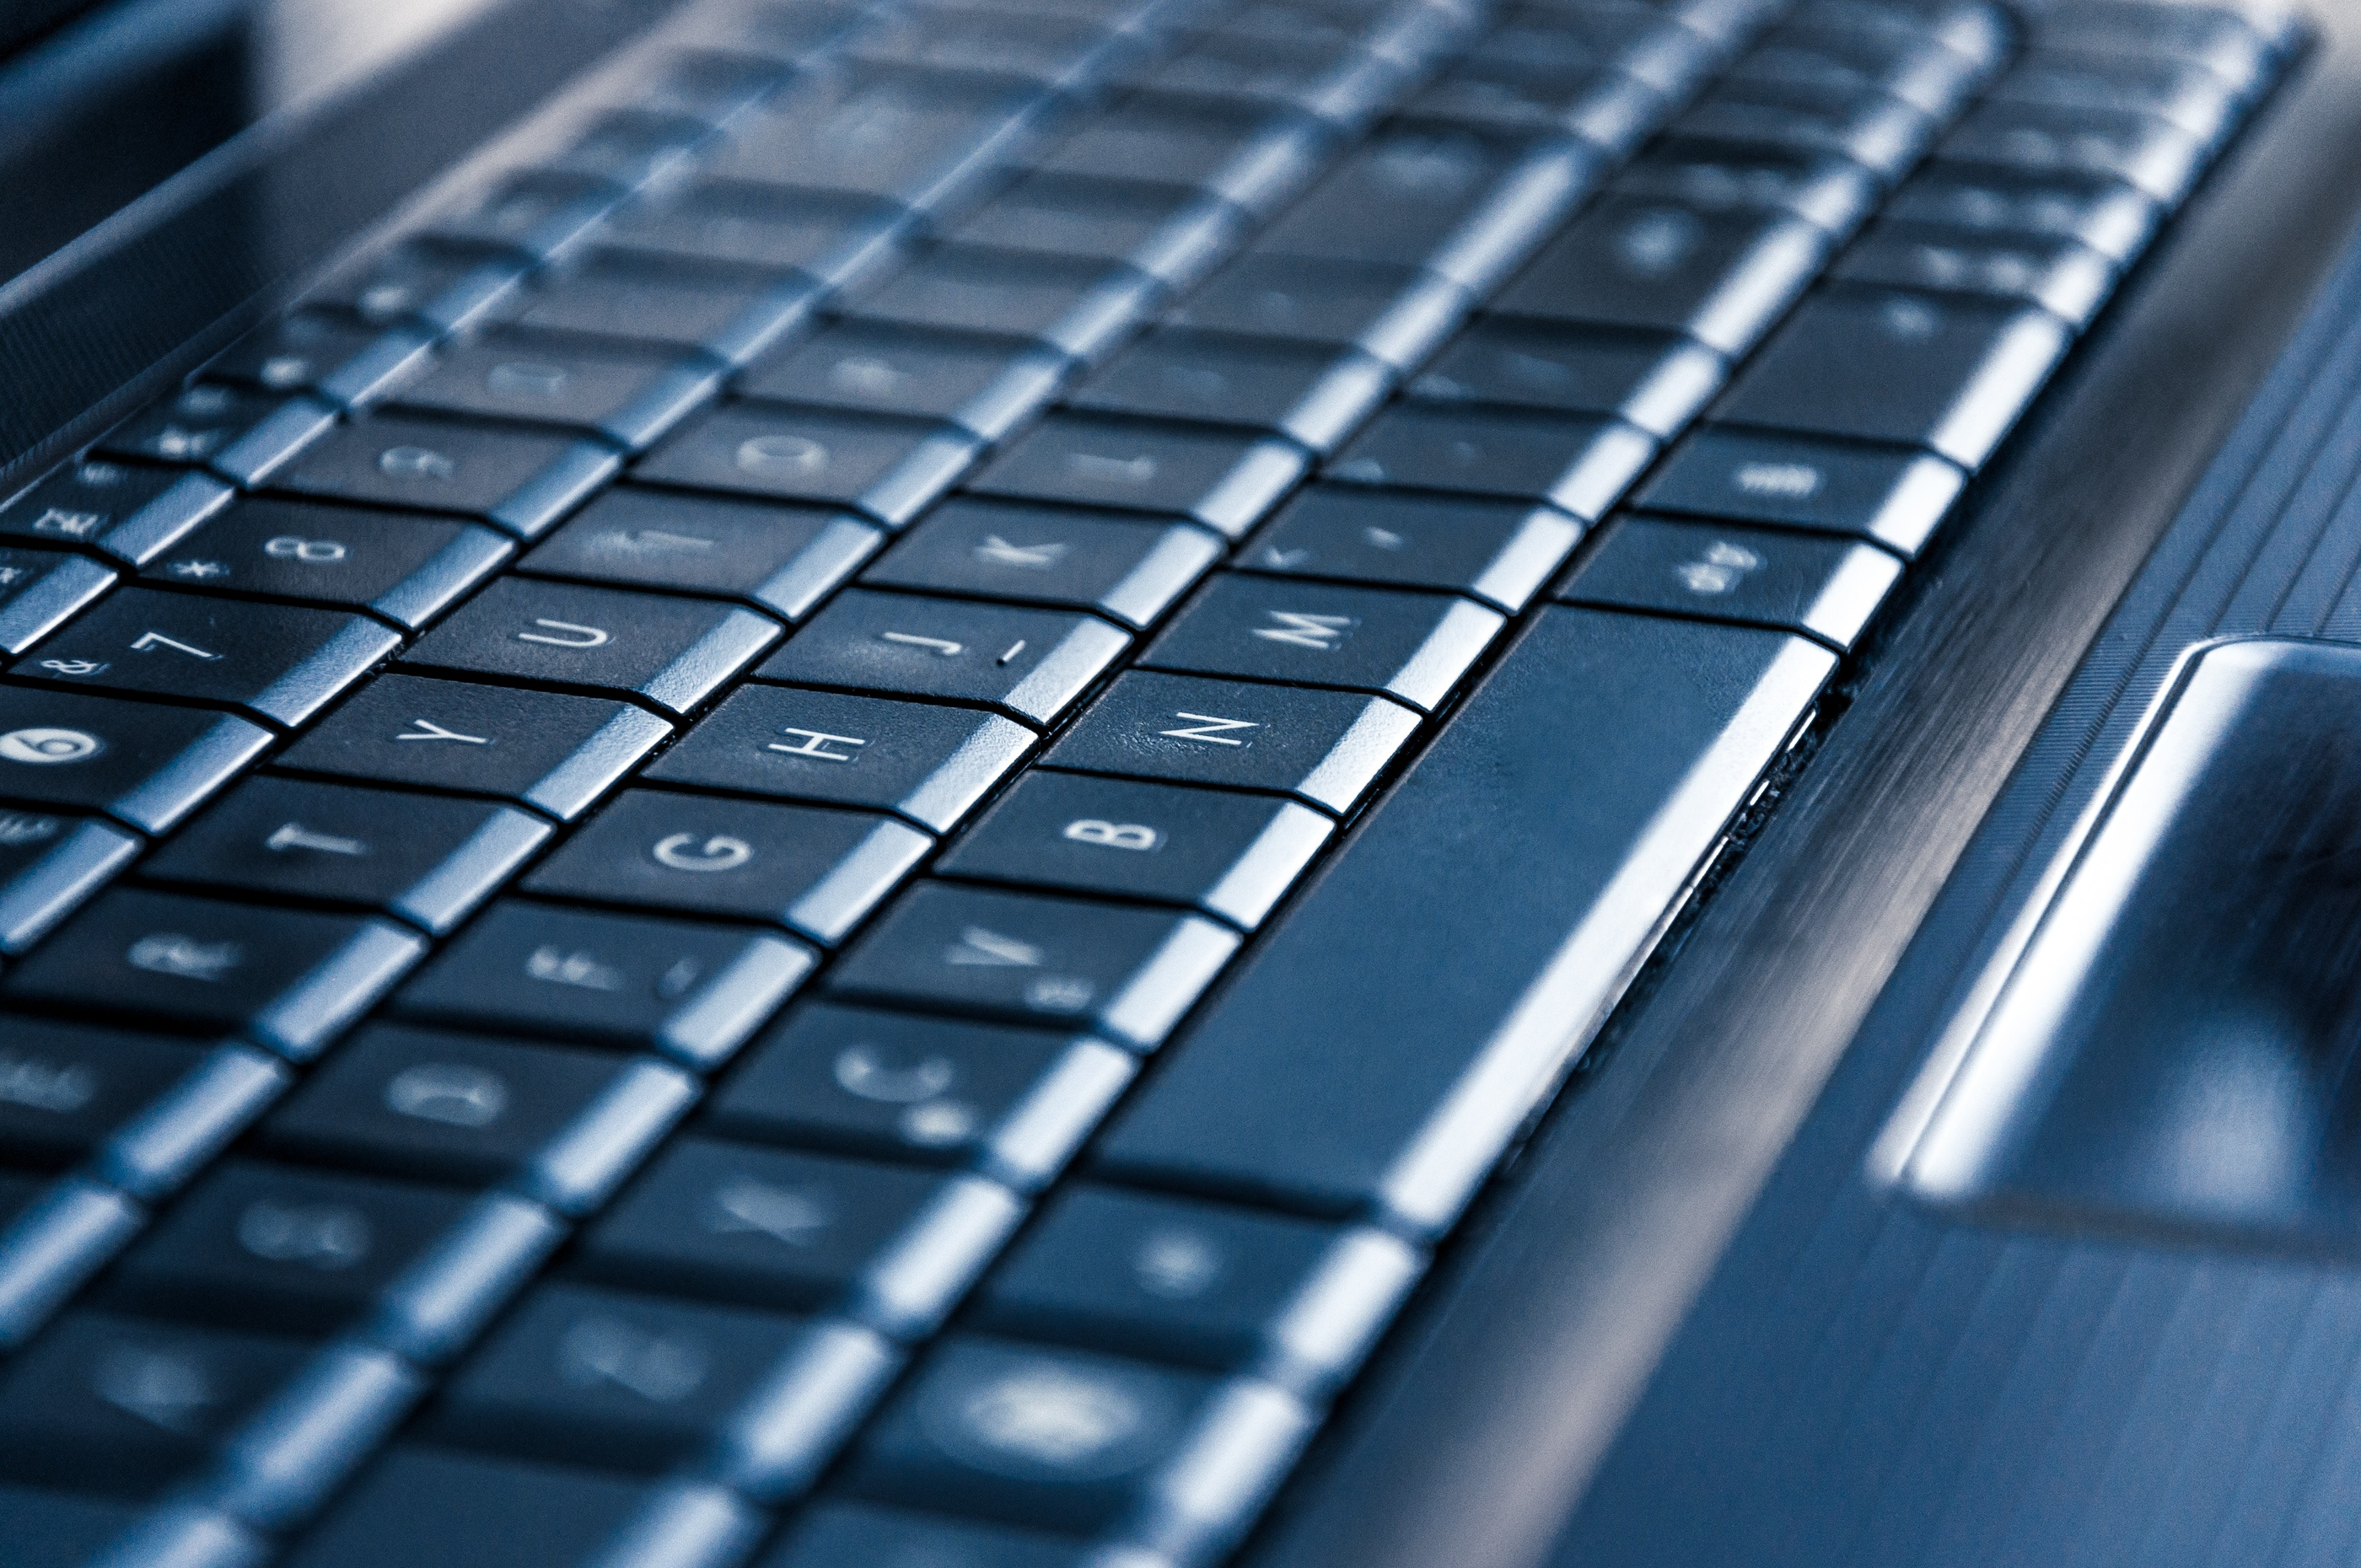 stockvault-computer-keyboard174192.jpg